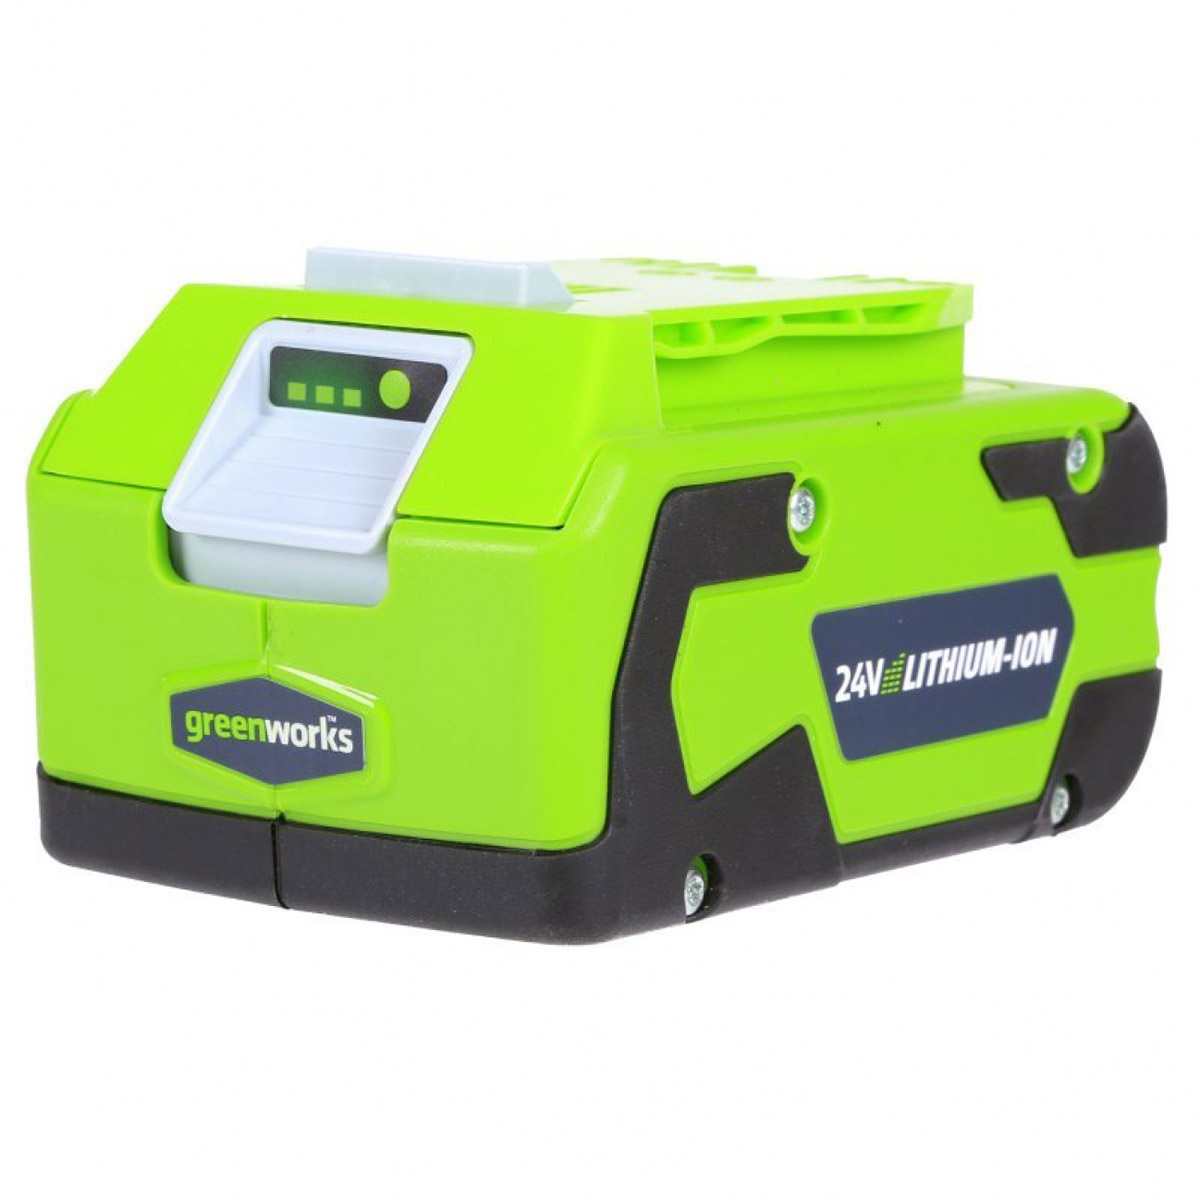 Аккумулятор для инструмента Greenworks G24B4 24V, 4 А.ч аккумулятор для инструмента greenworks g60b4 60v 4 а ч